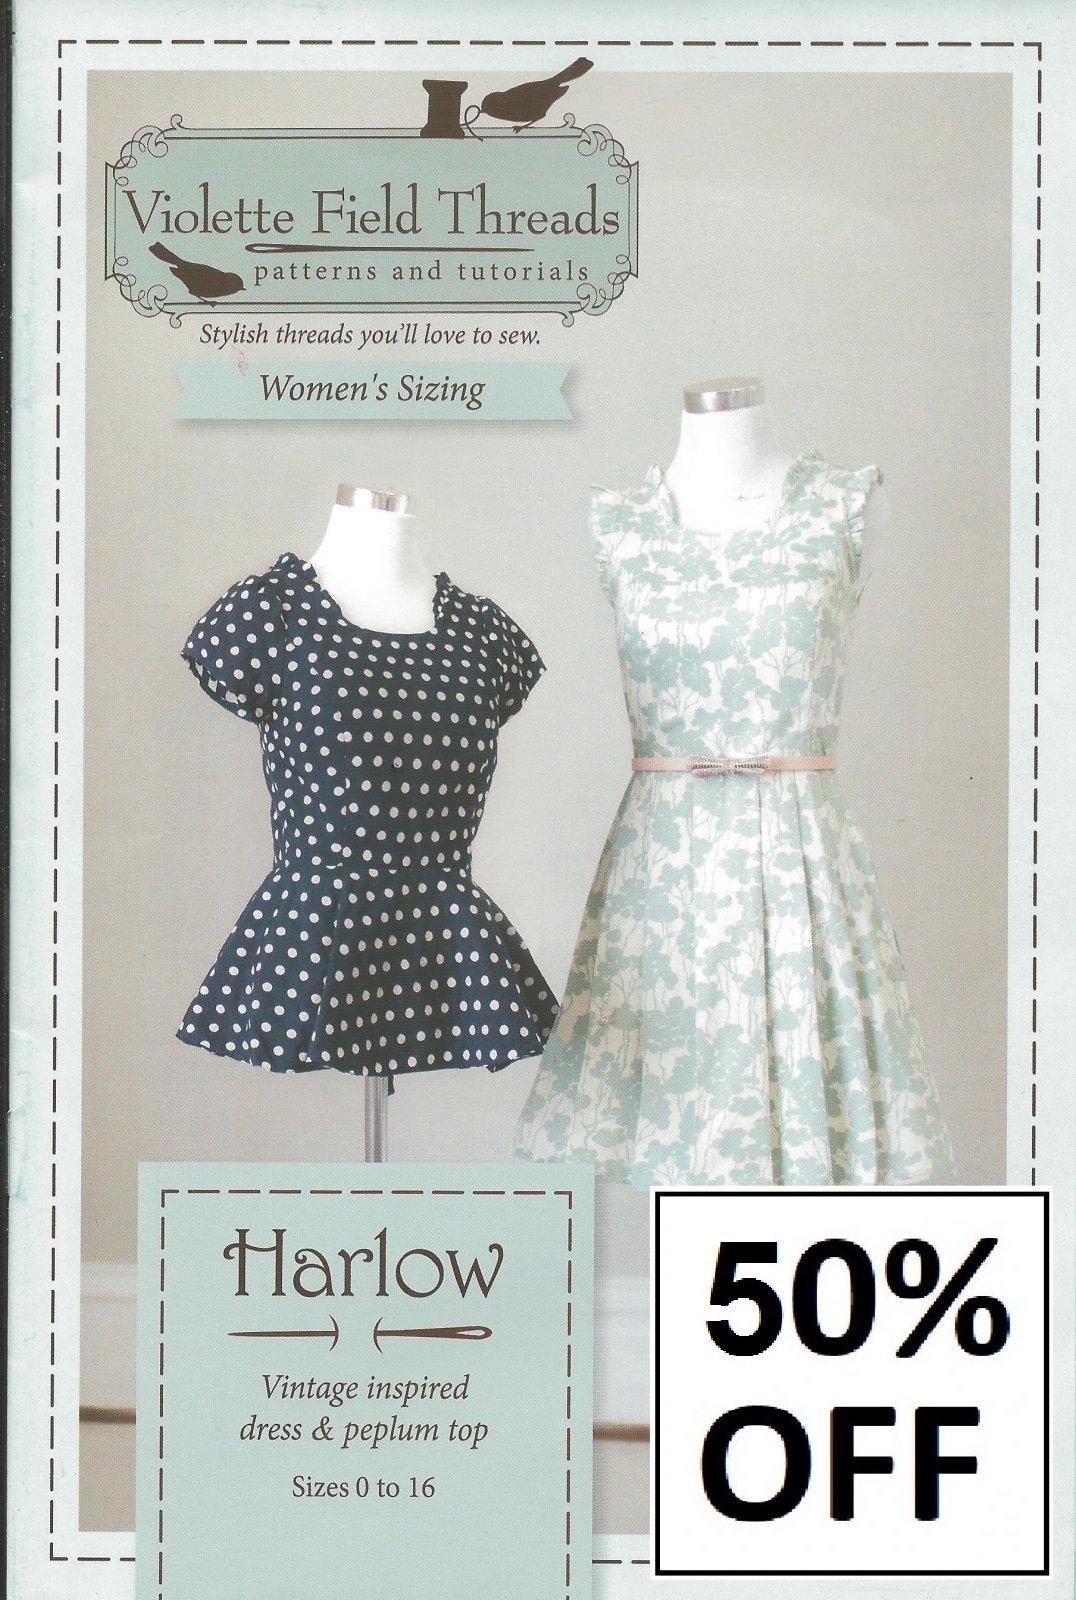 Harlow - 50% off